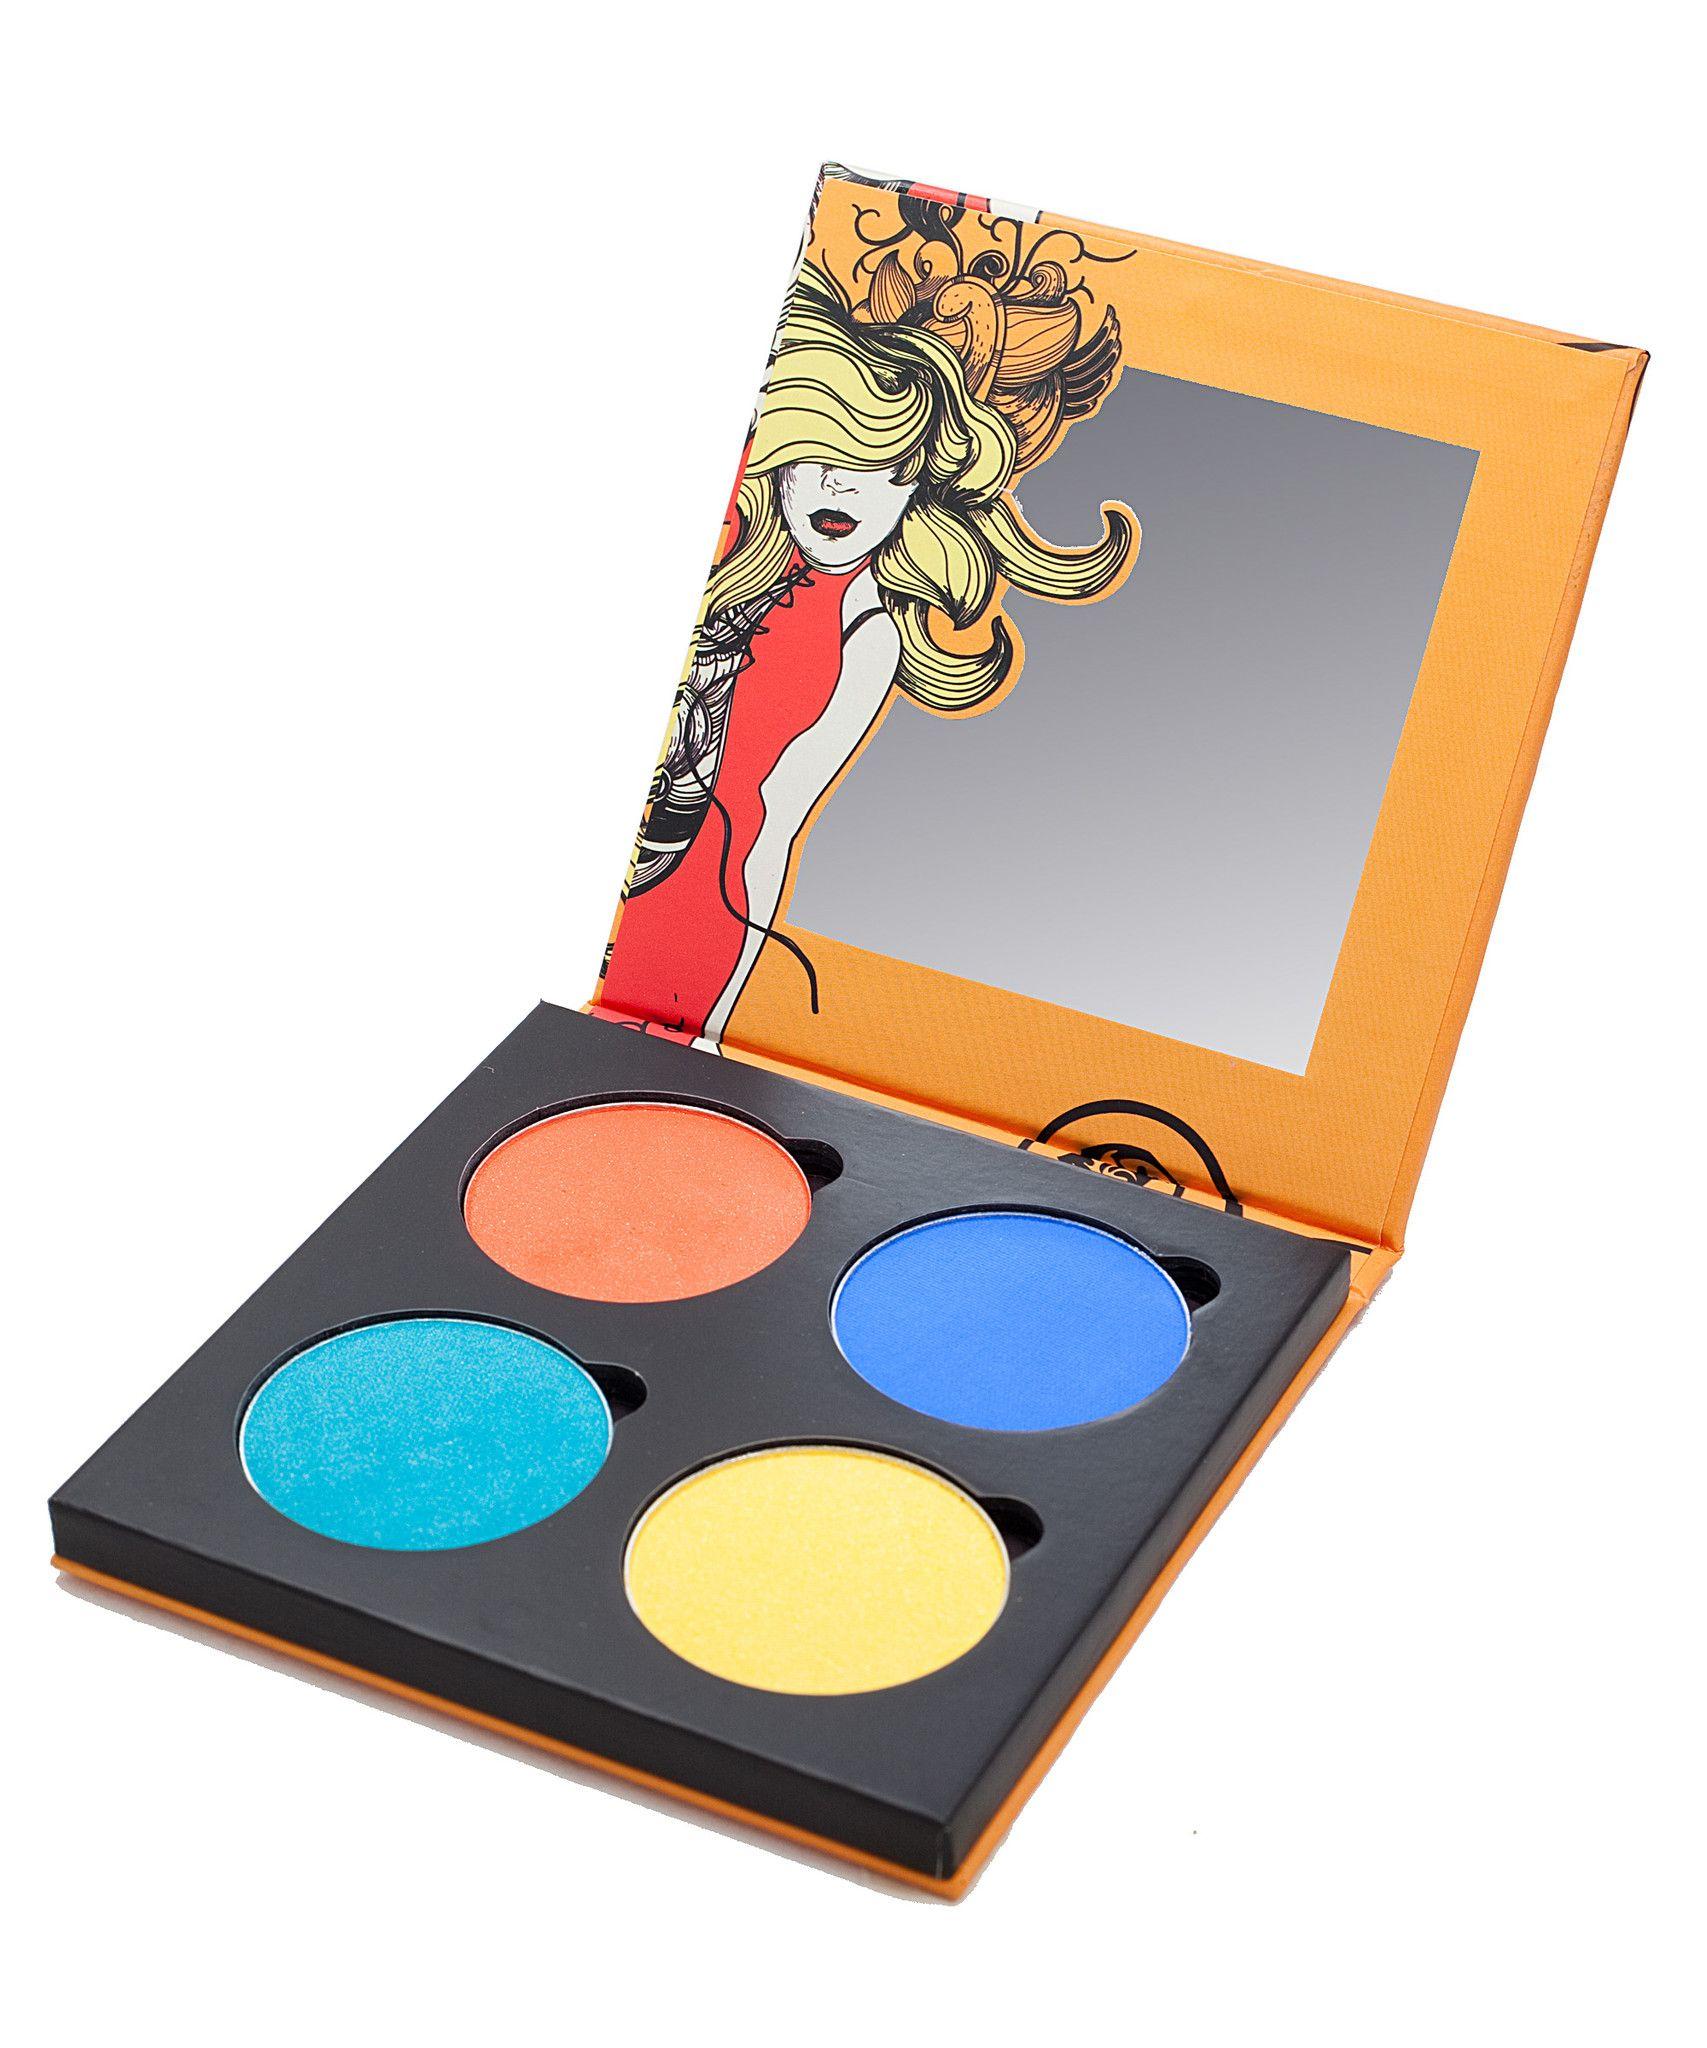 Saucebox Cosmetics TEMPTATION PALETTE SALE 20.00 Reg. 30